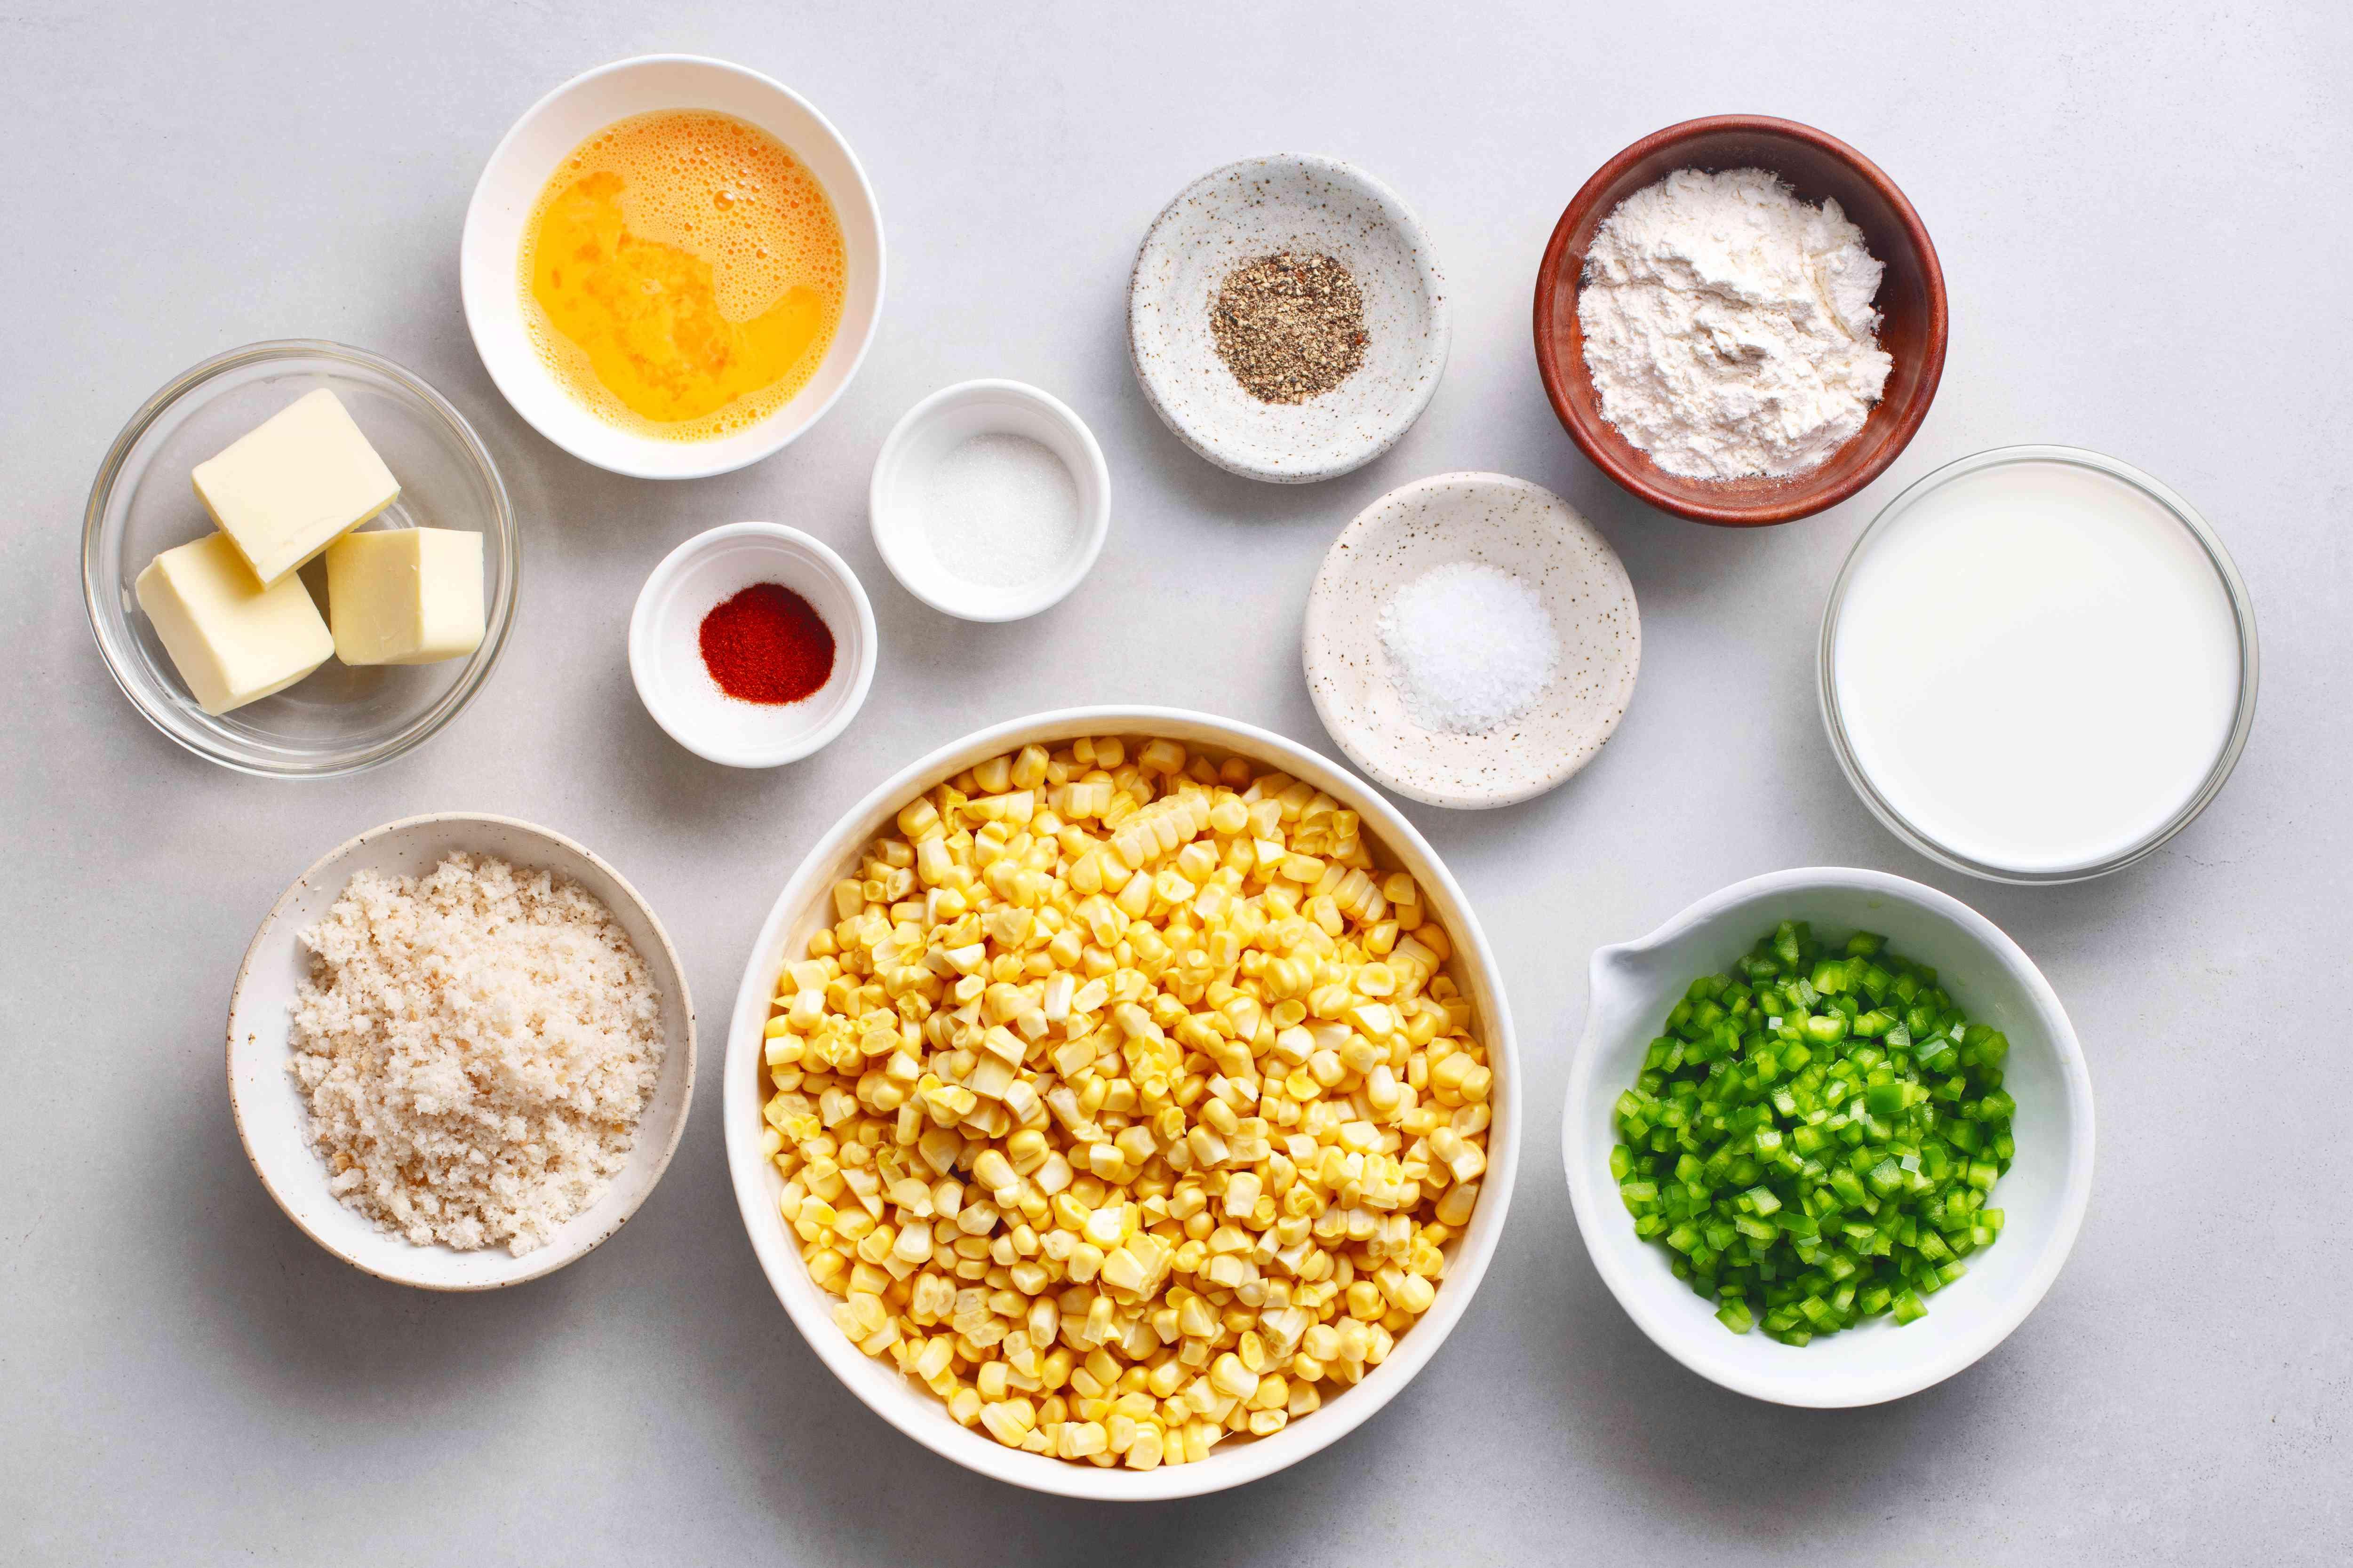 Scalloped Corn Casserole ingredients